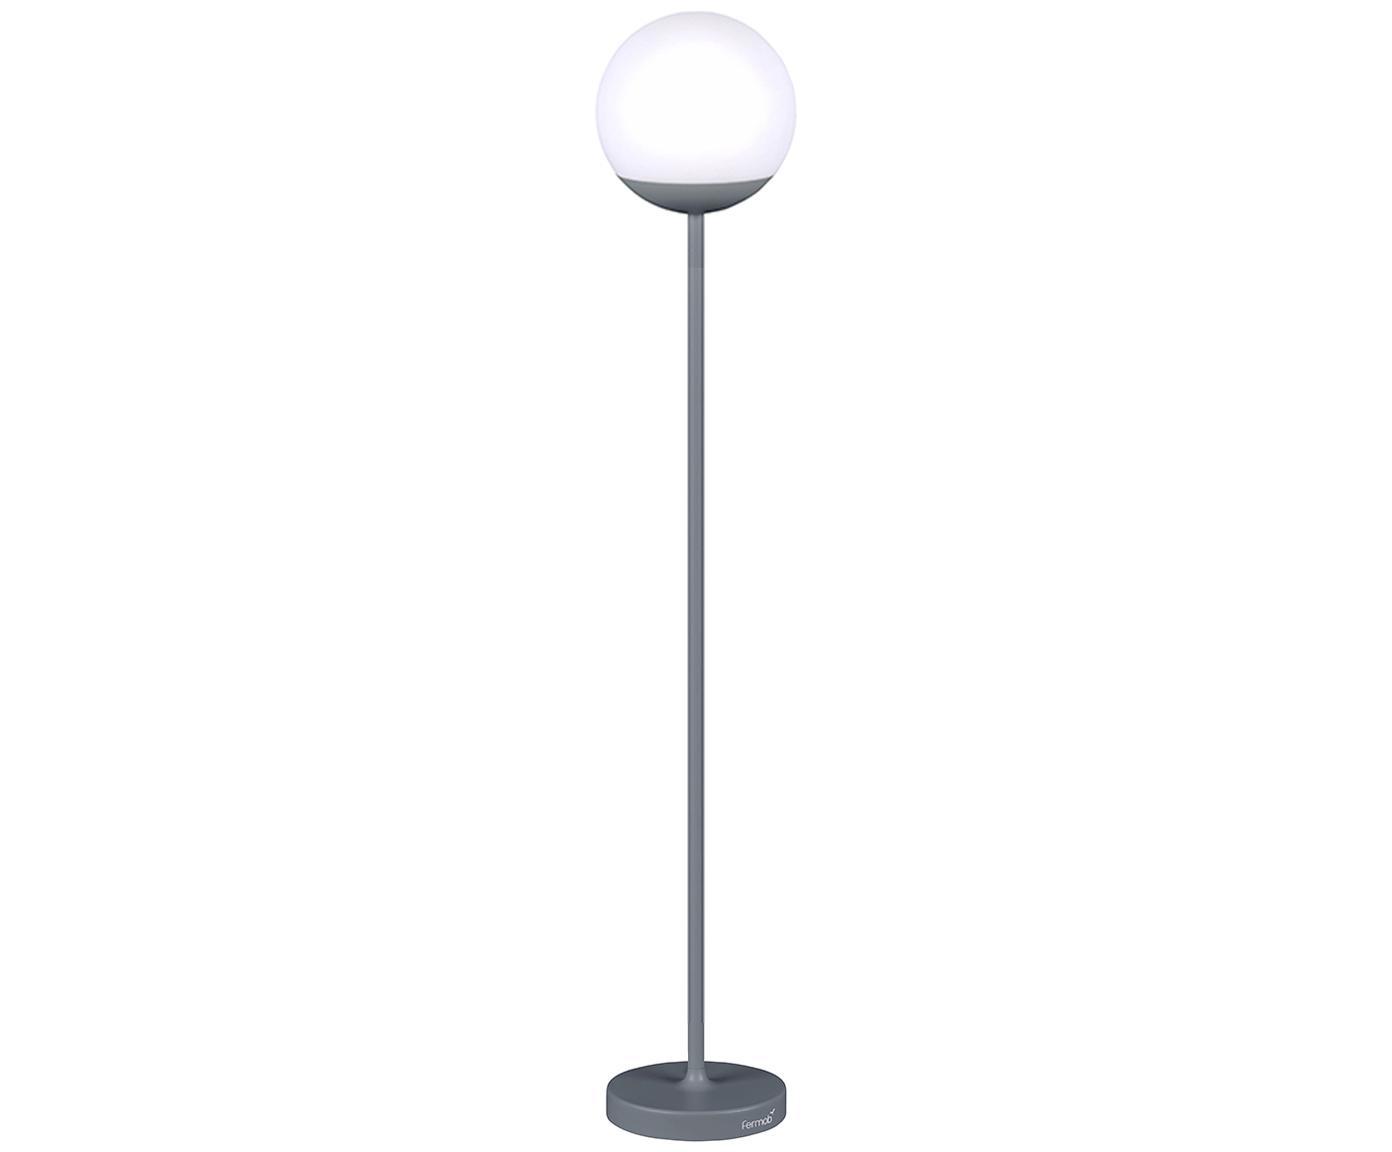 Lampada portatile da esterno a LED Mooon, Paralume: materiale sintetico, Grigio tempera, Ø 25 x Alt. 134 cm